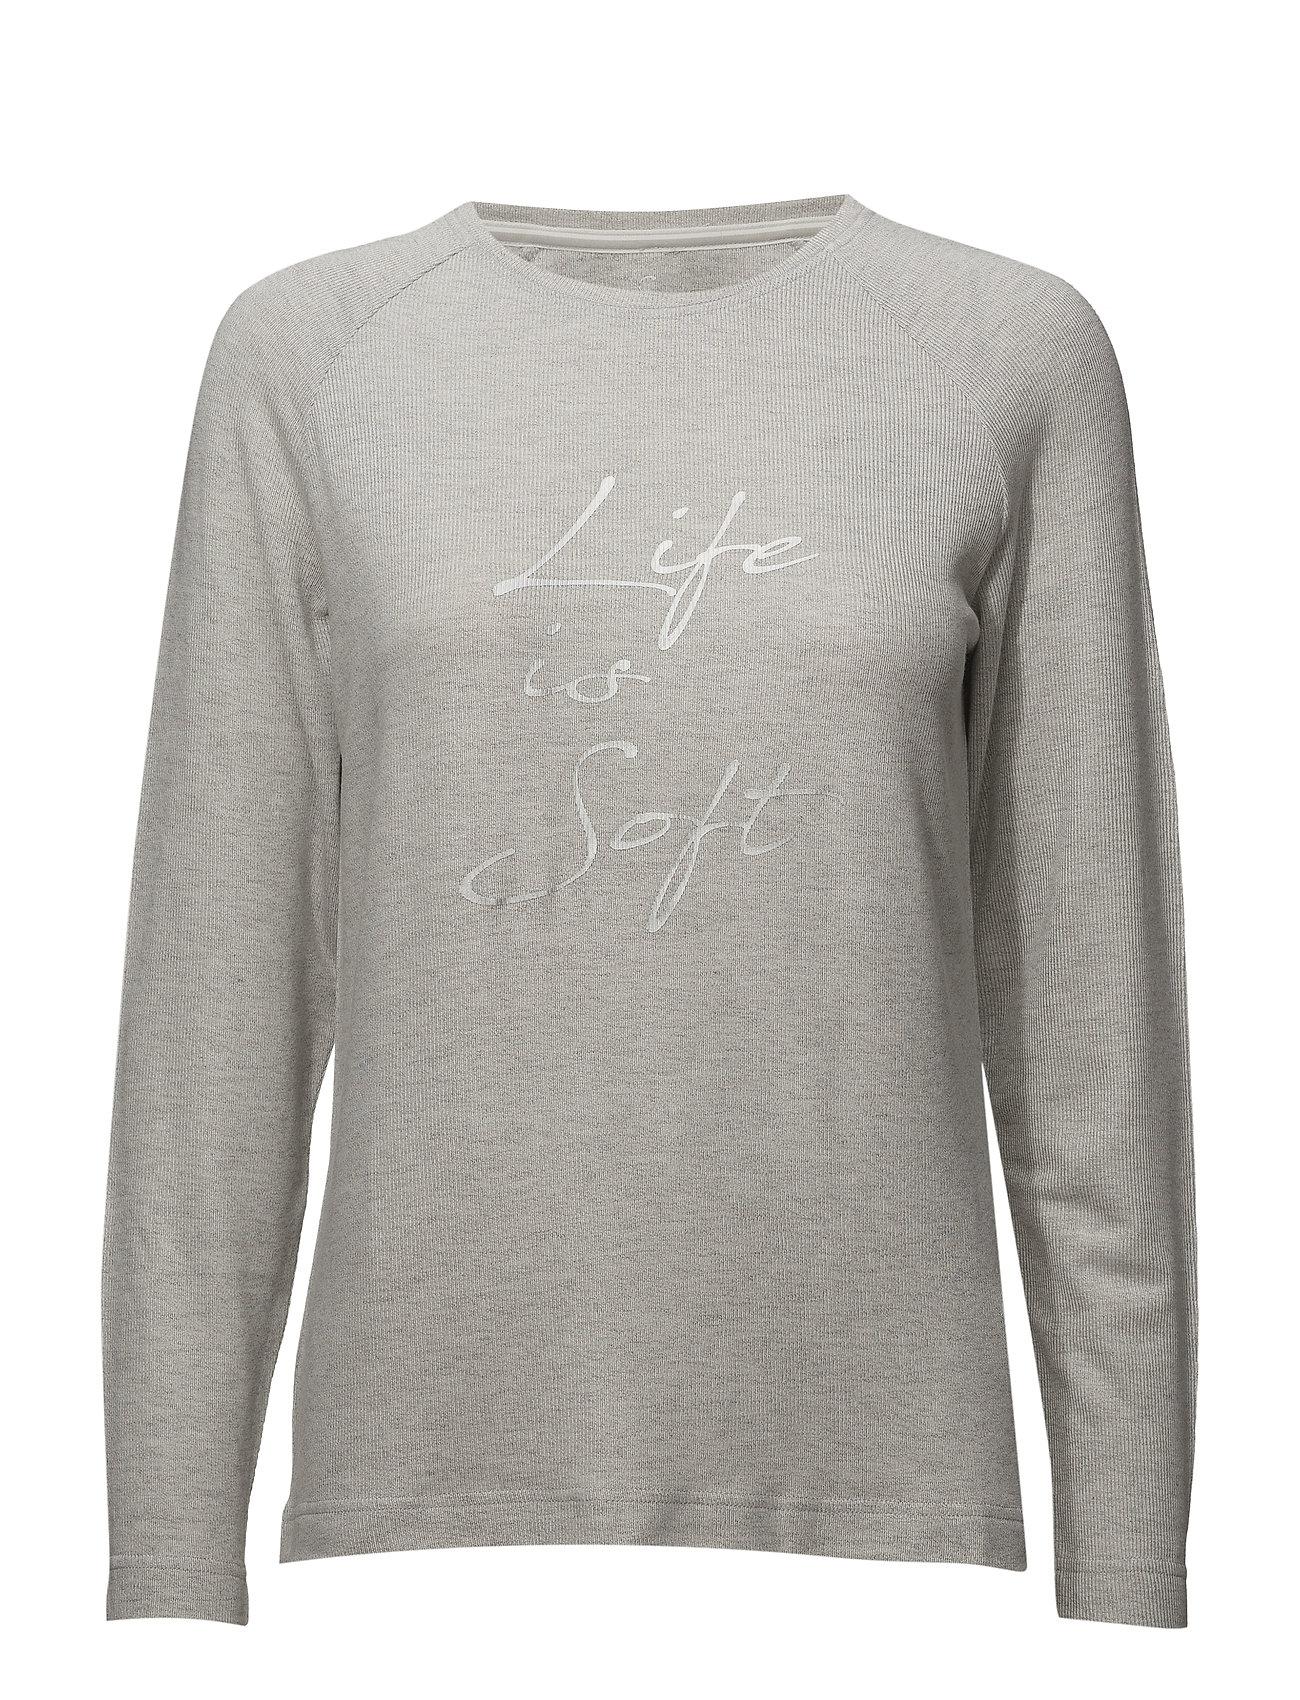 Signal Sweatshirt - STONE MEL.